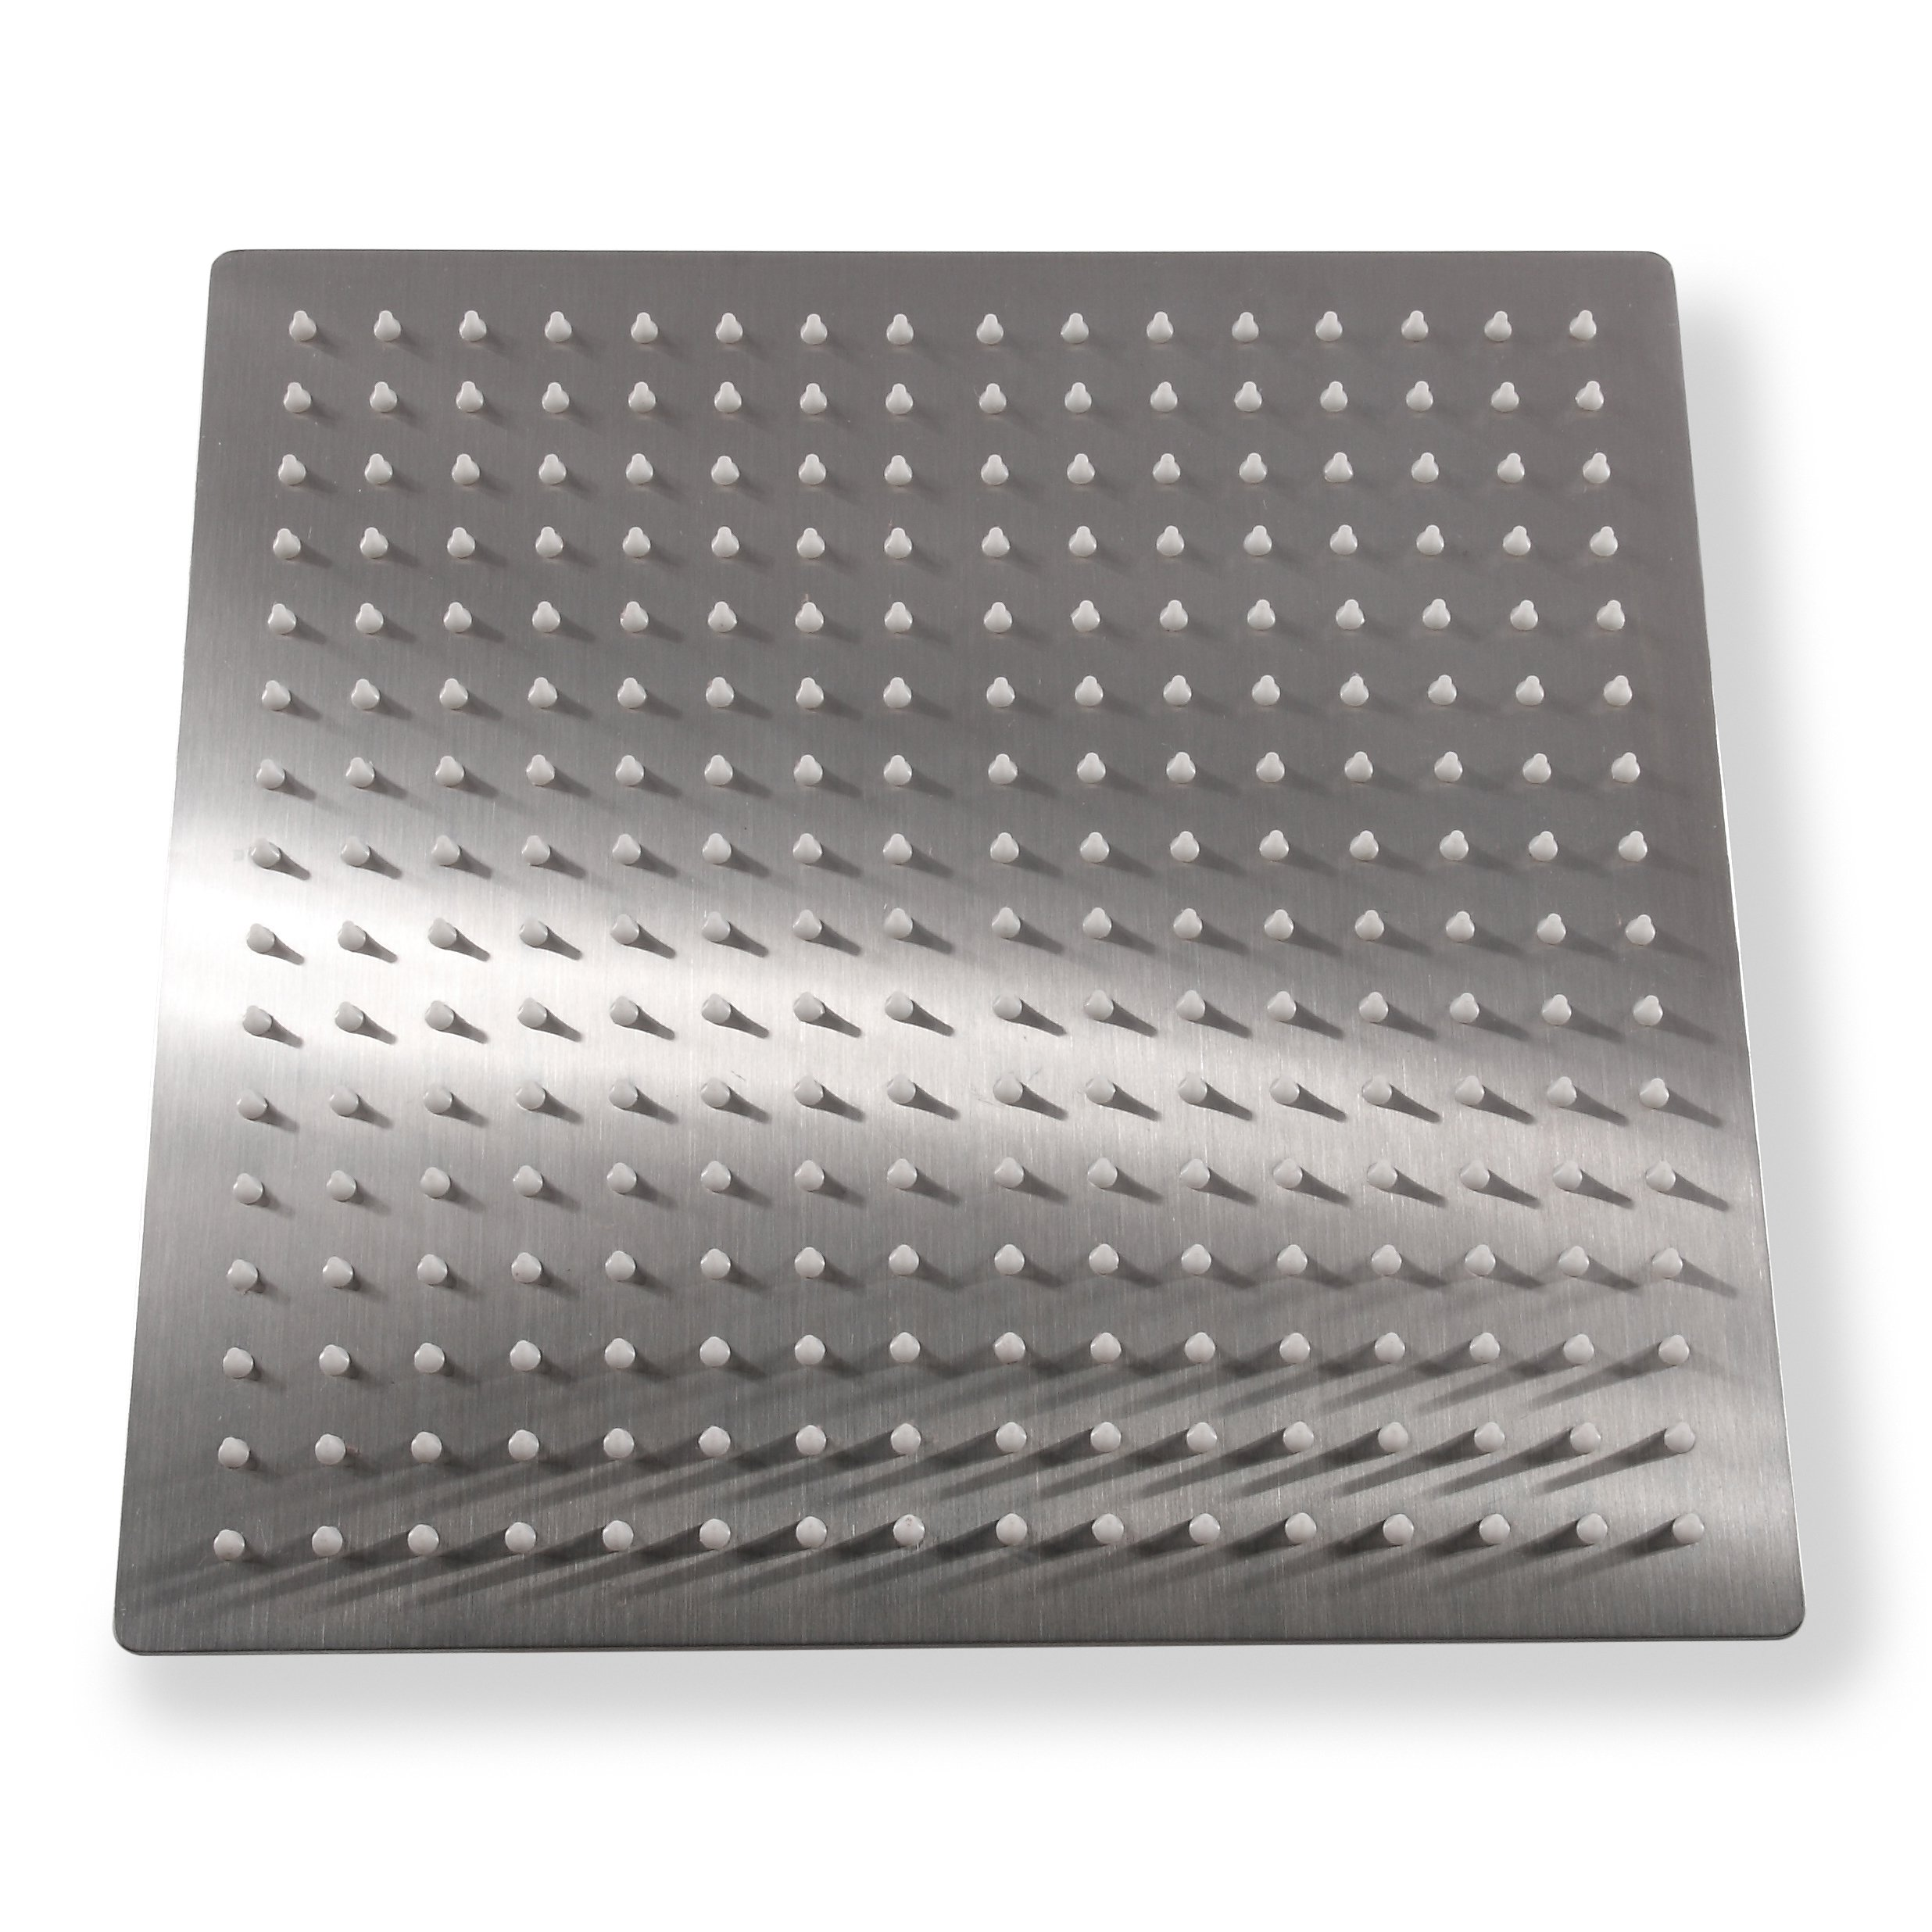 KiaRog® 12 Inch (12'') Rain Brushed Shower Head. 12-Inch Side,1/16'' Ultra Thin Showerheads.30 CM * 30 CM Stainless Steel Shower